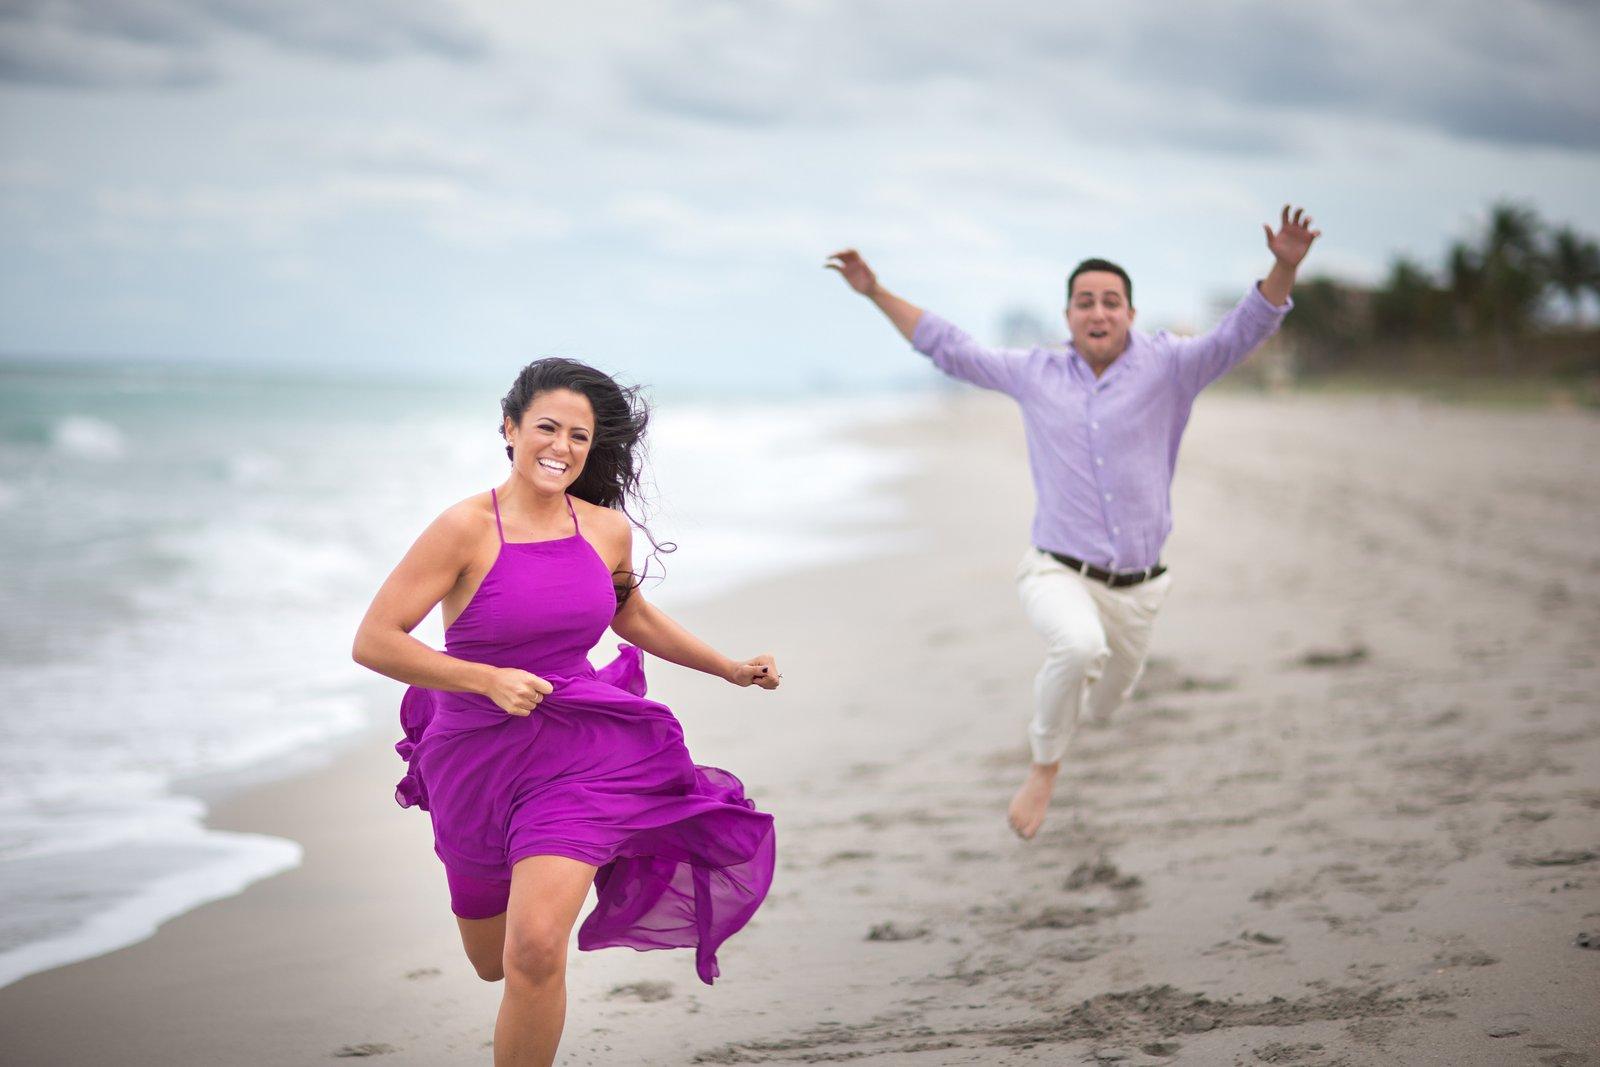 hilarious maimi beach enagement photos